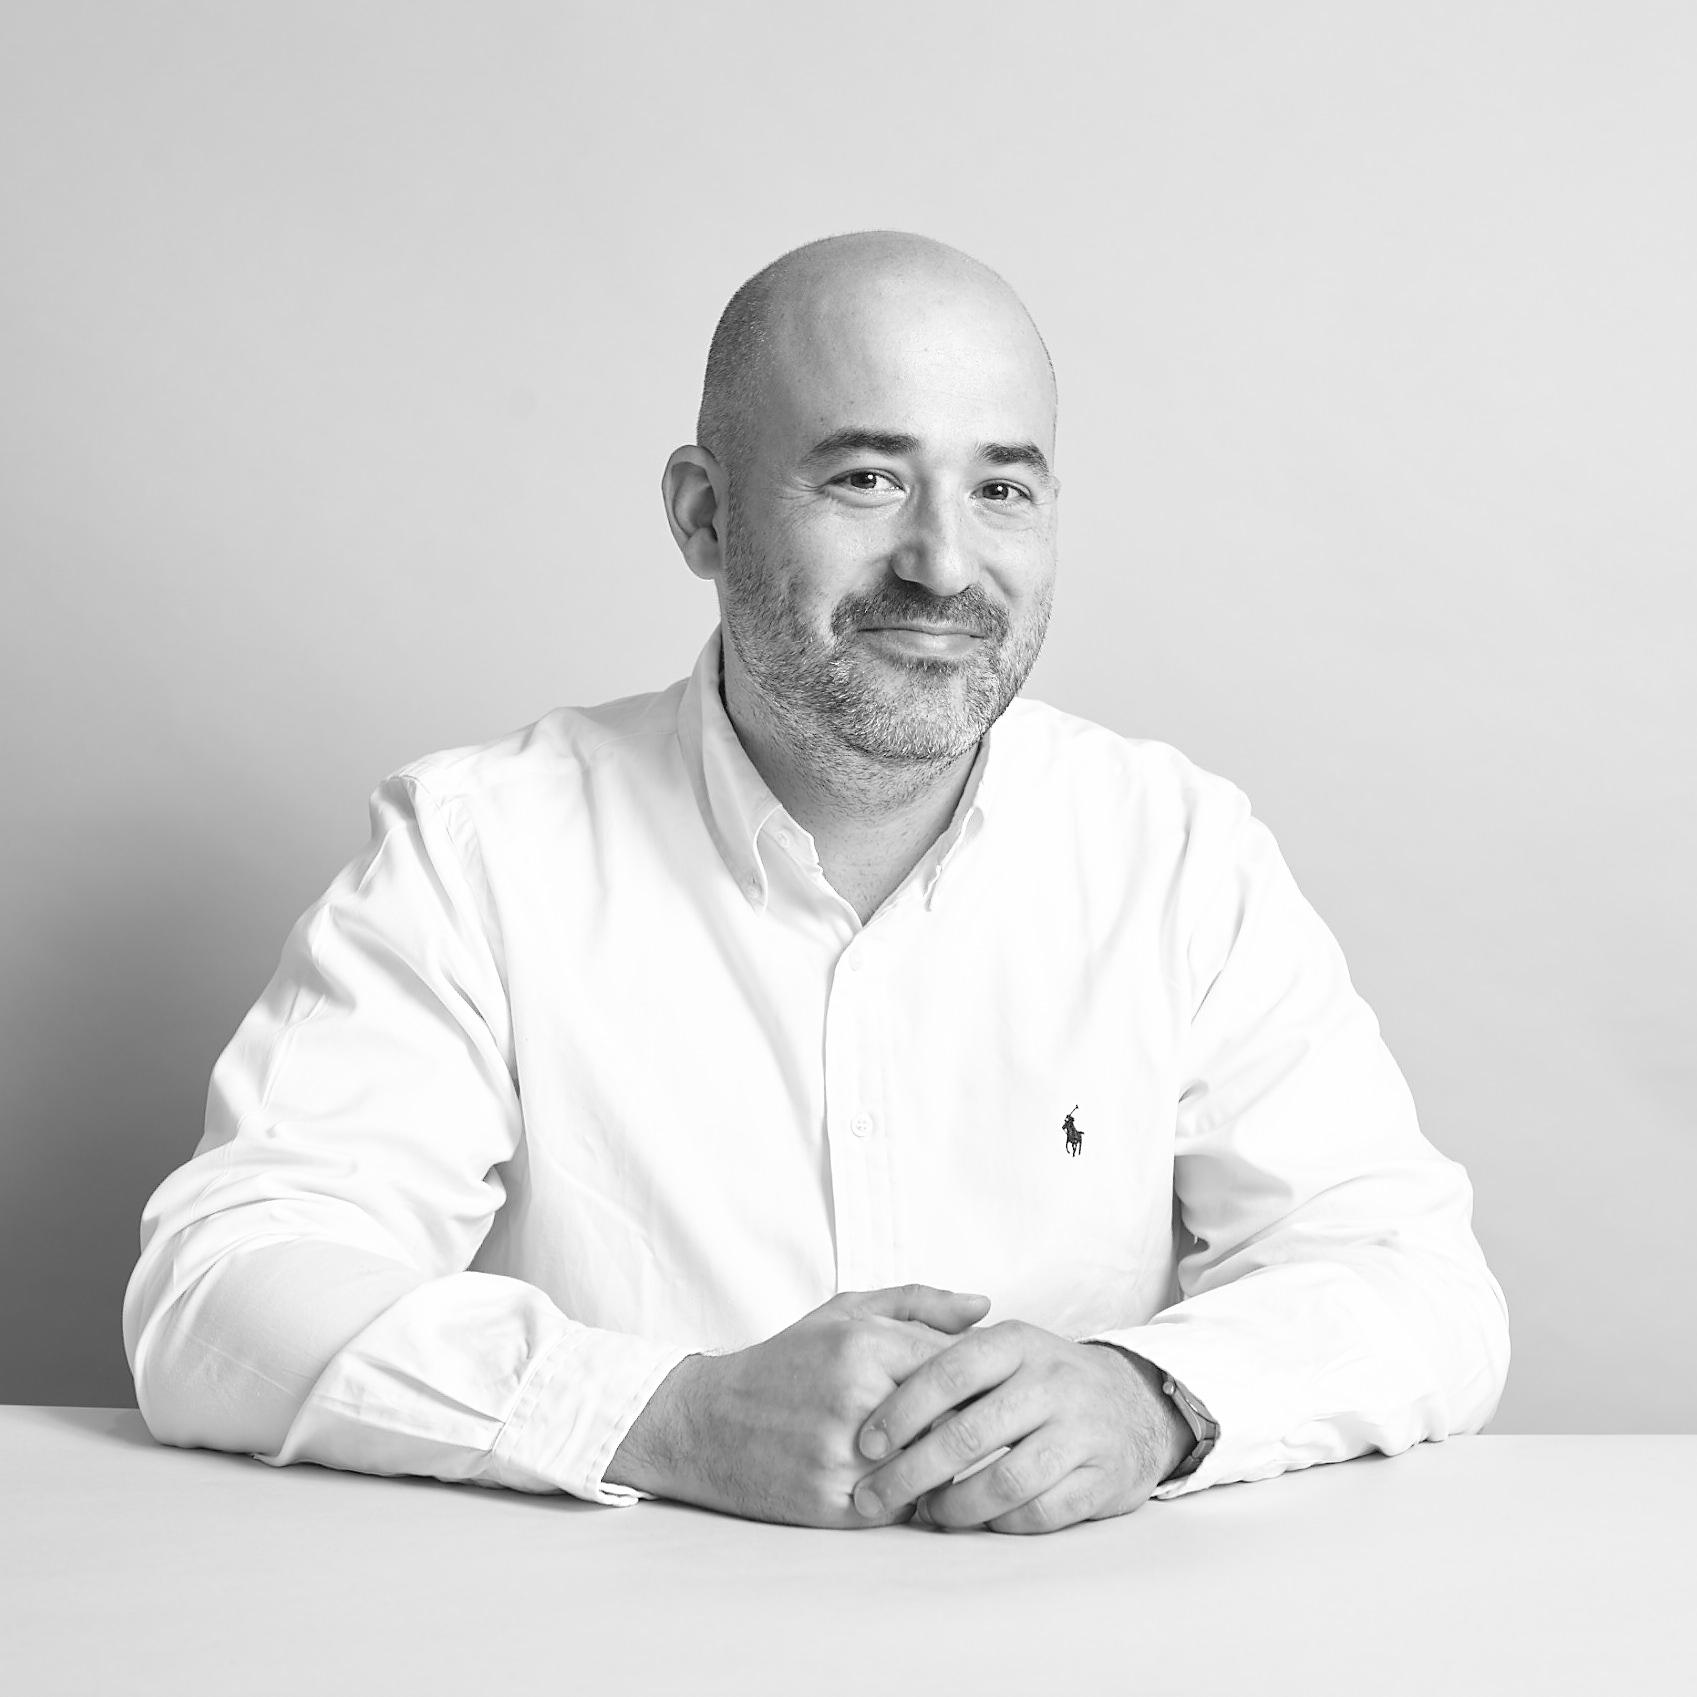 Juan Esteban Medina